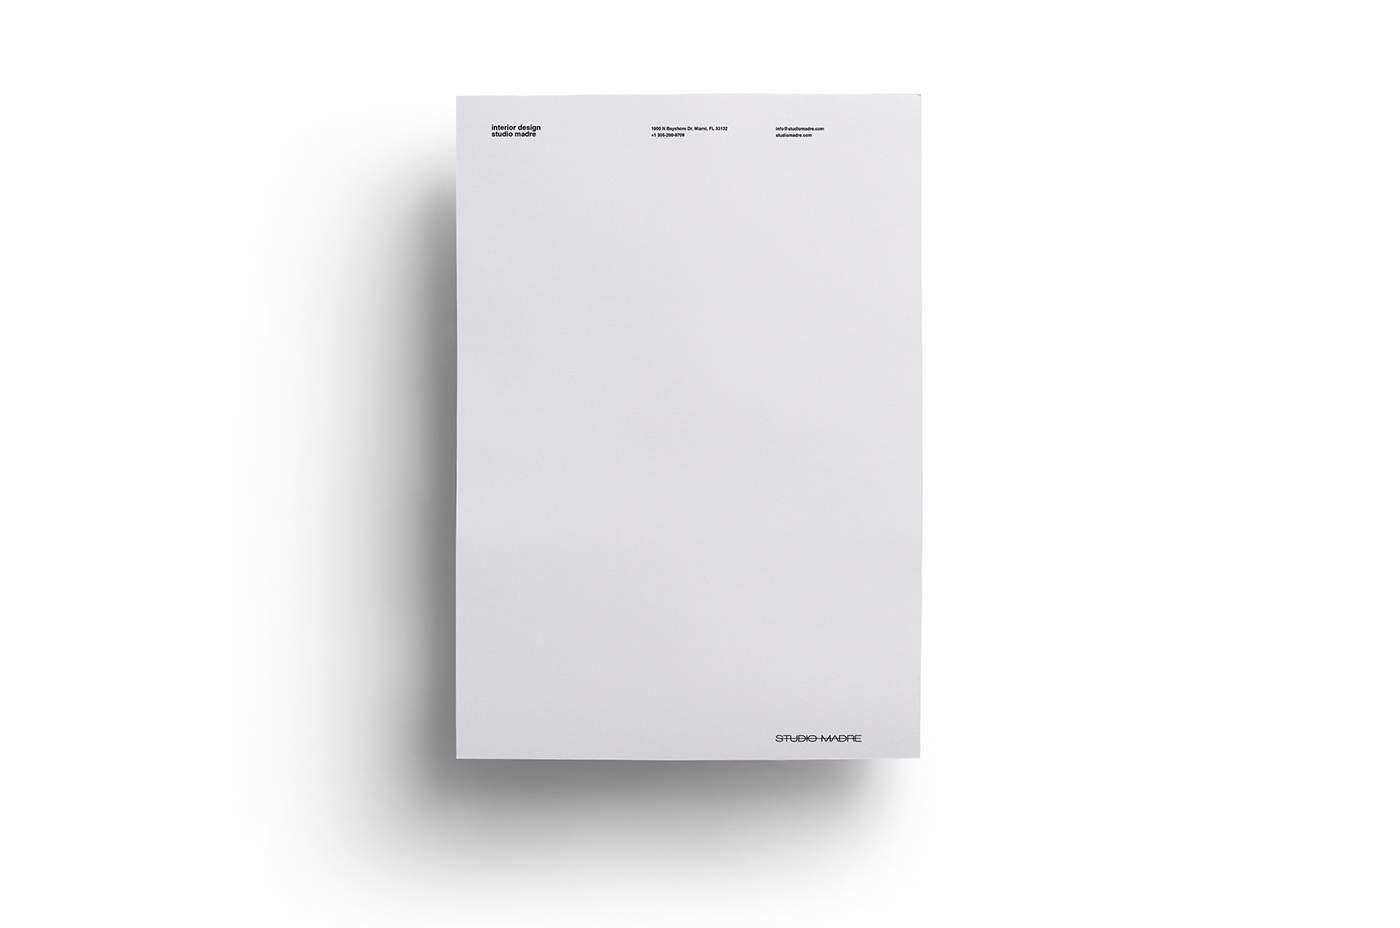 branding  brand identity minimalistic Illustrator photoshop InDesign black White design Stationery